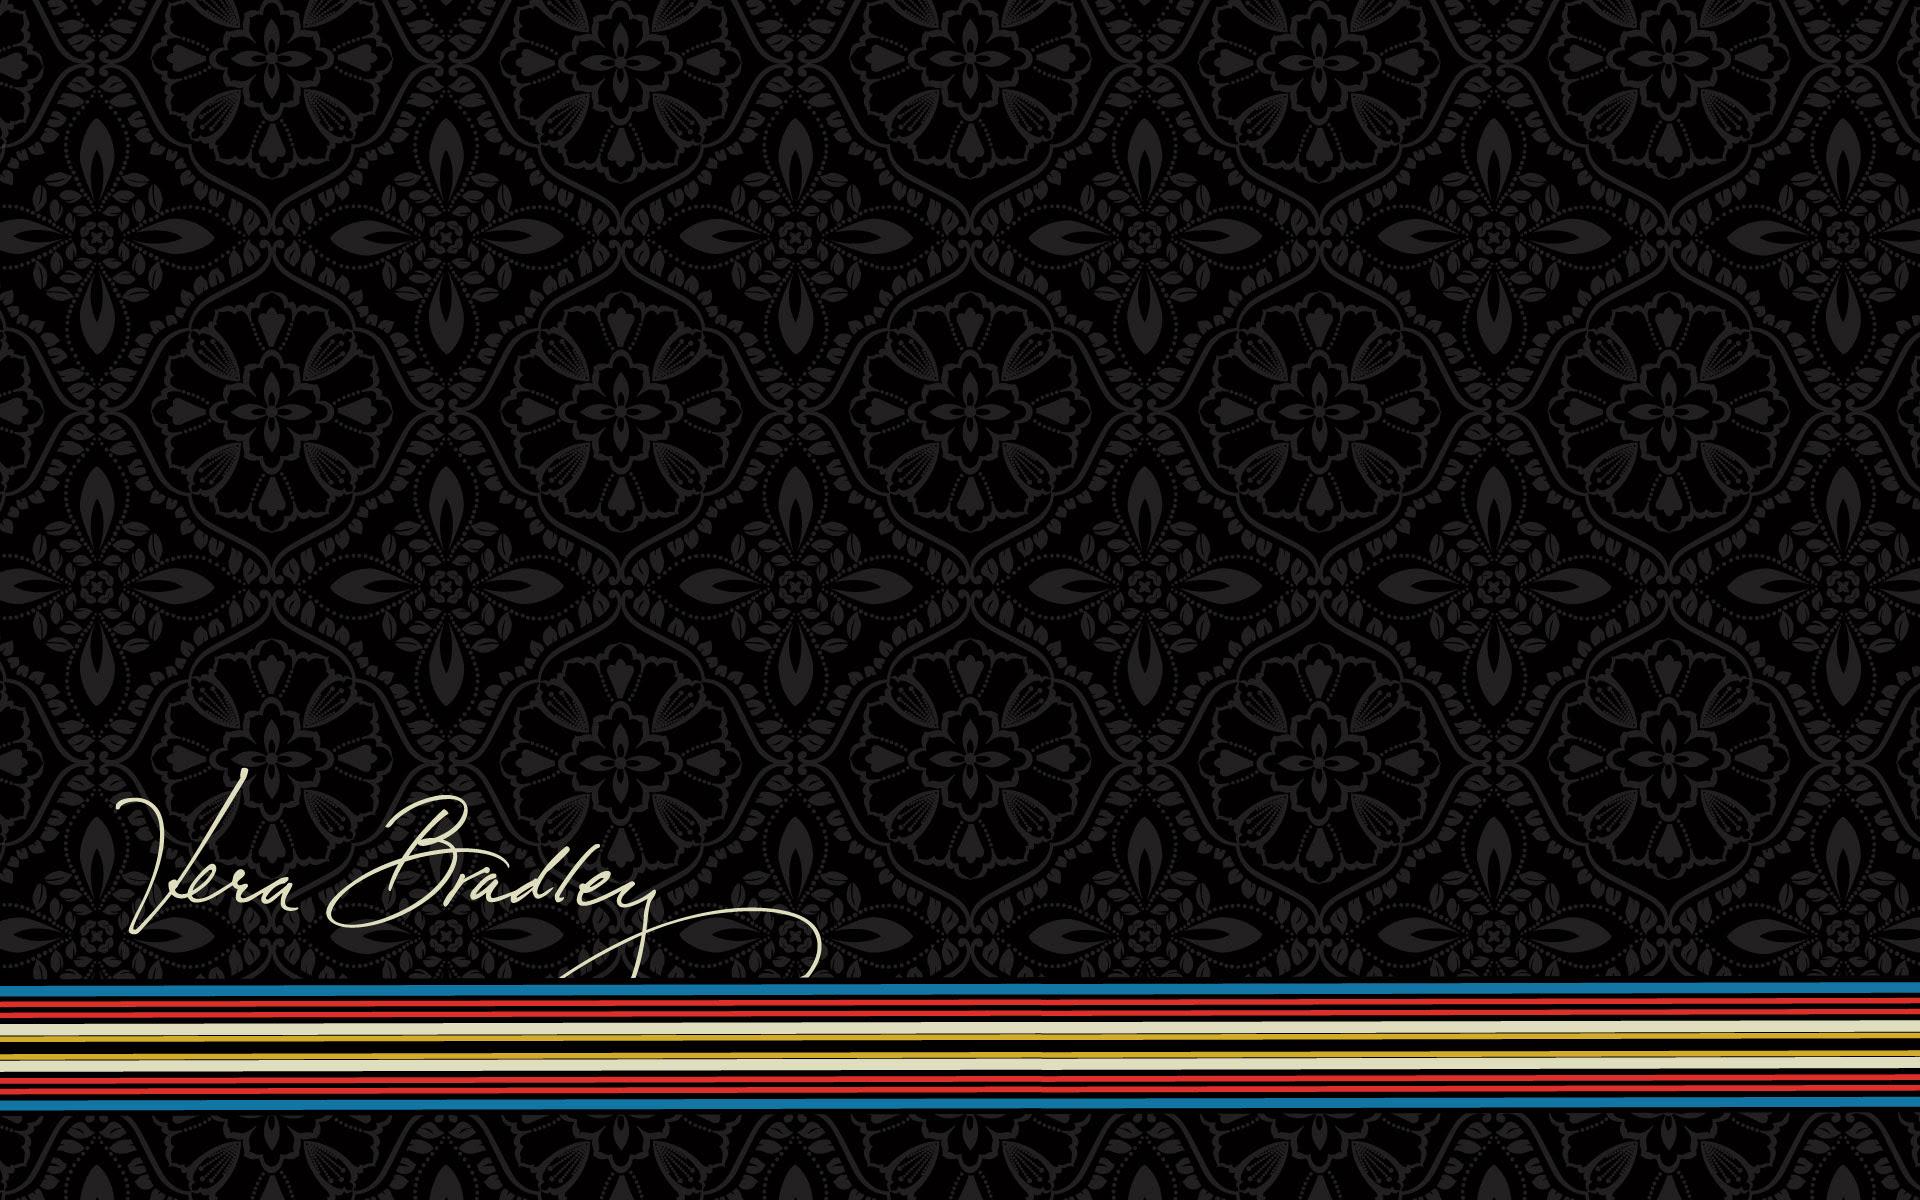 Vb Wallpapers Vera Bradley Wallpaper 35126639 Fanpop